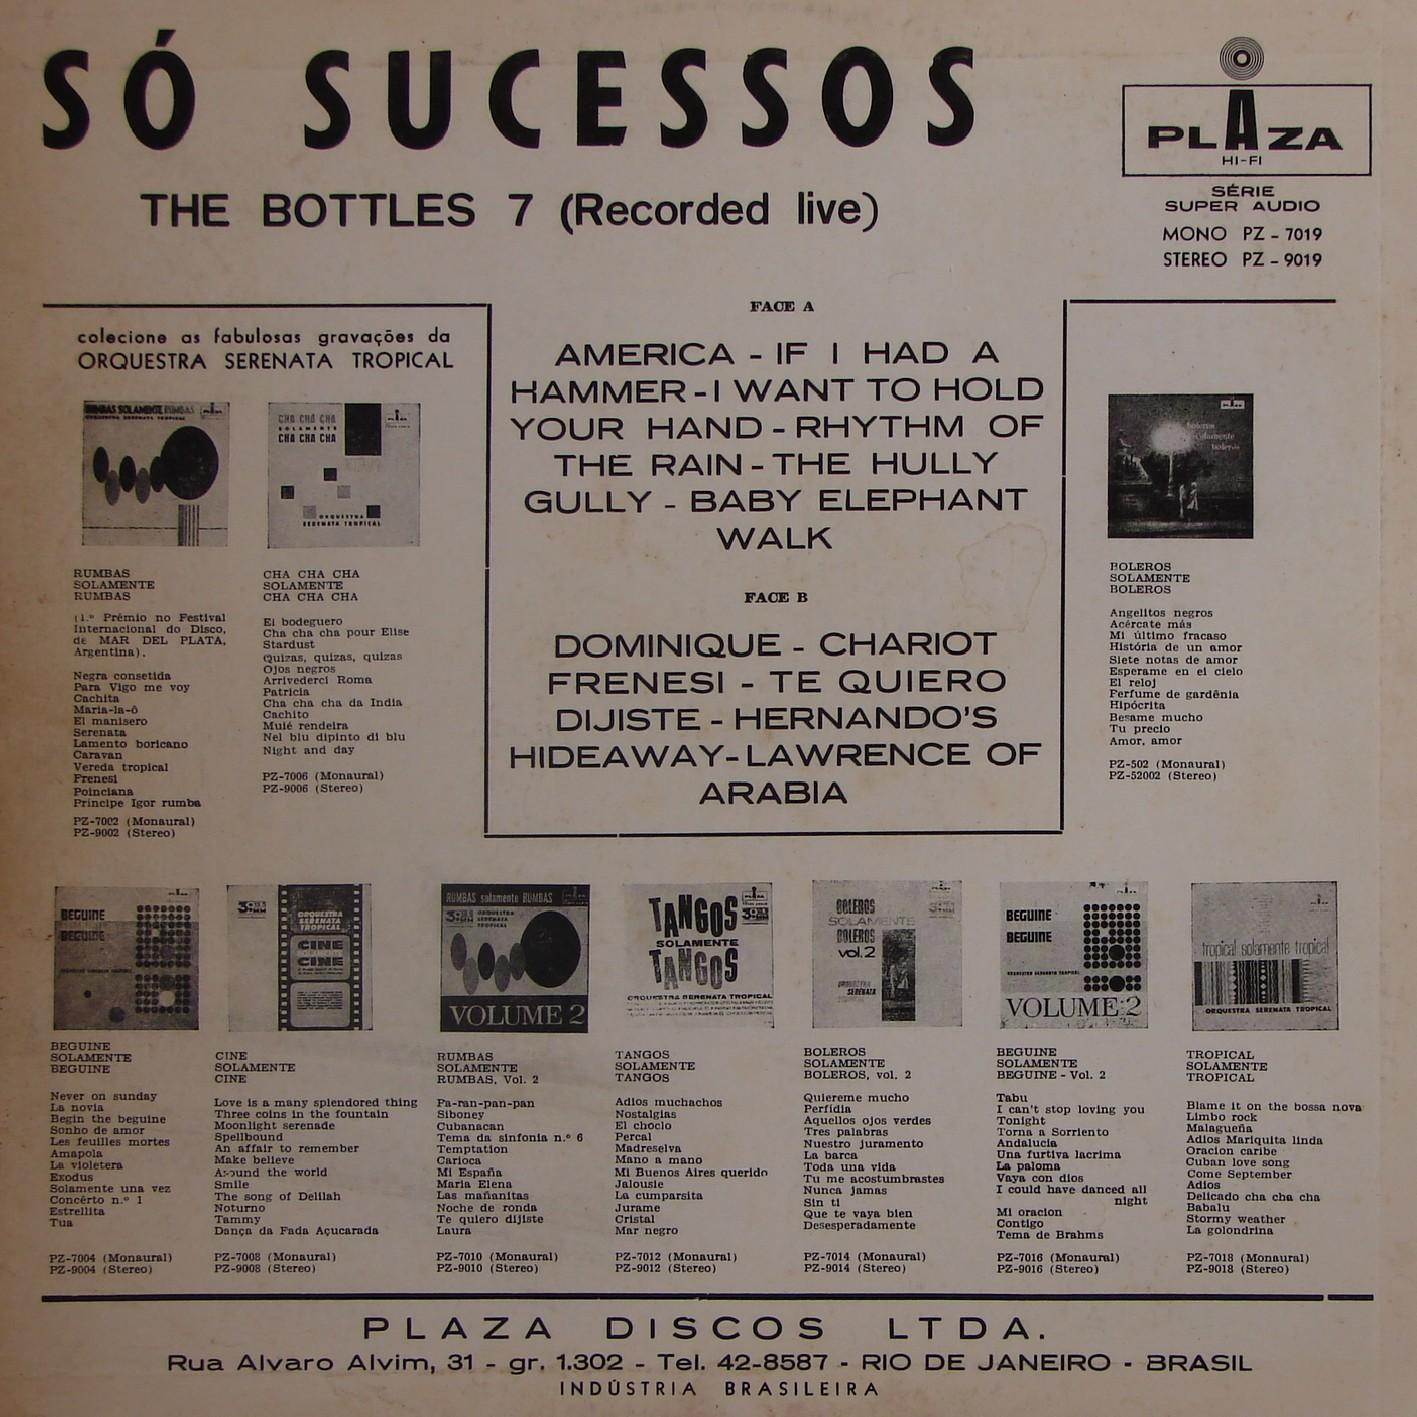 cd amado batista 1980 download